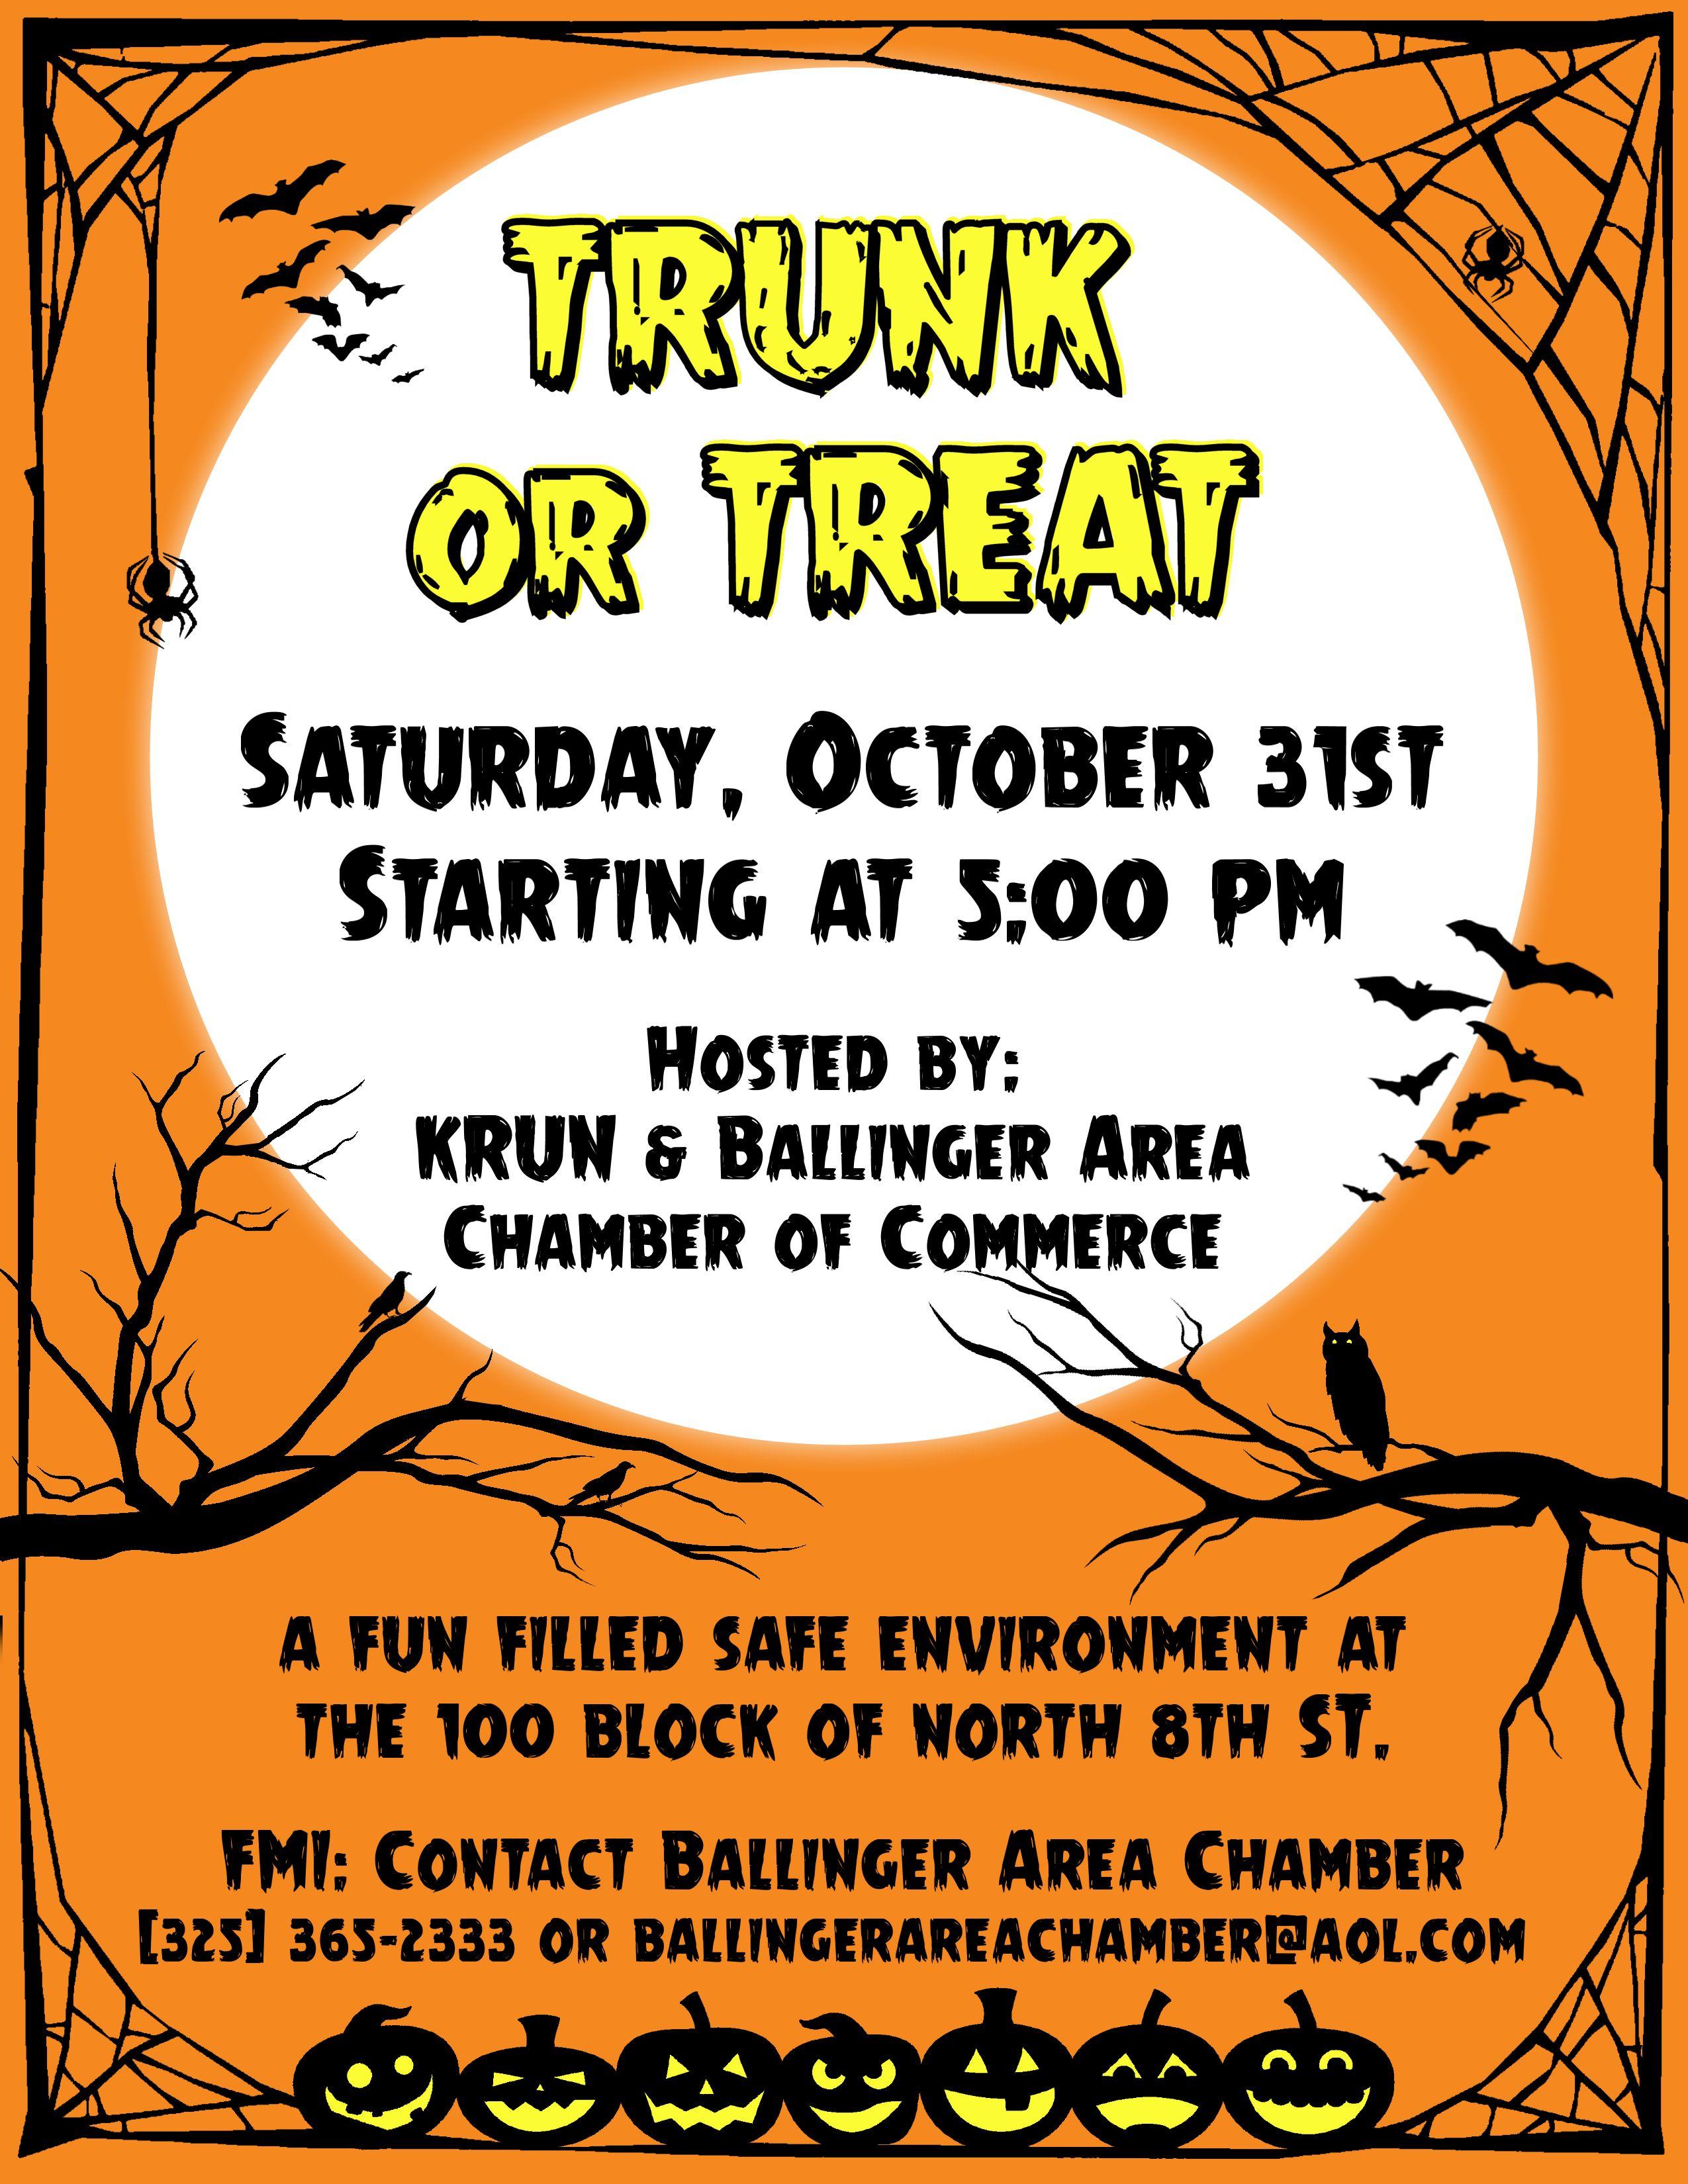 trunk or treat flyer corey van zandt